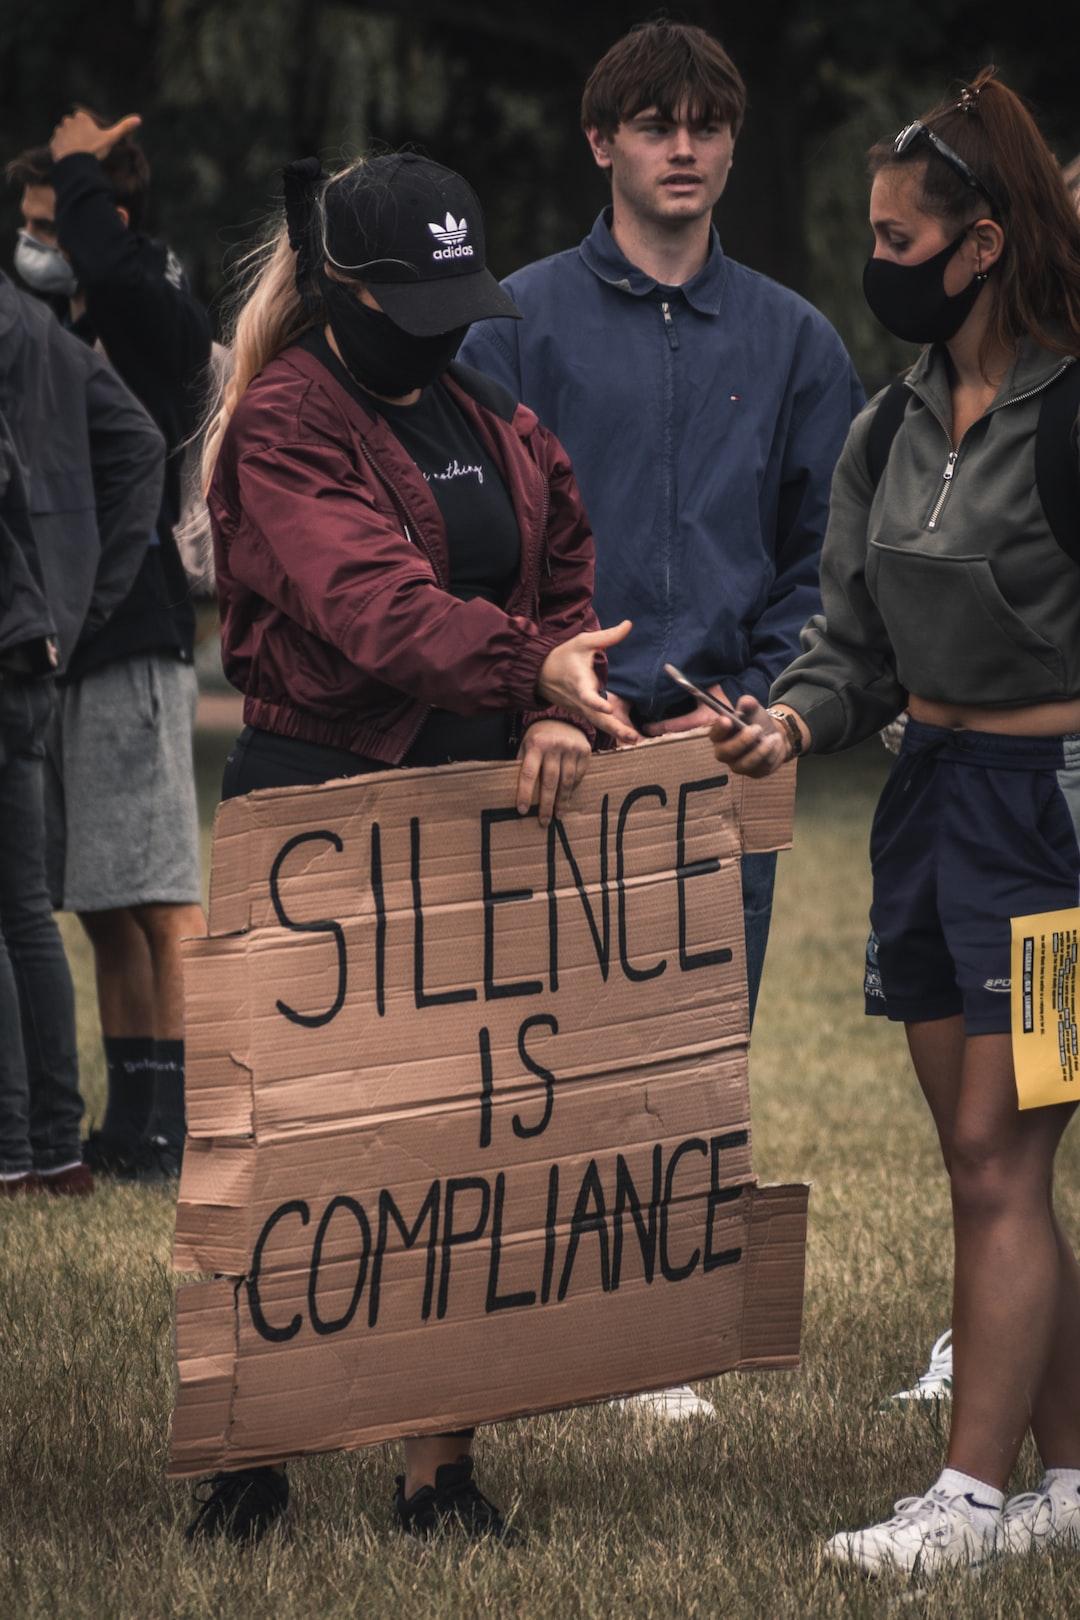 Black Lives Matter Protesters, Leamington Spa